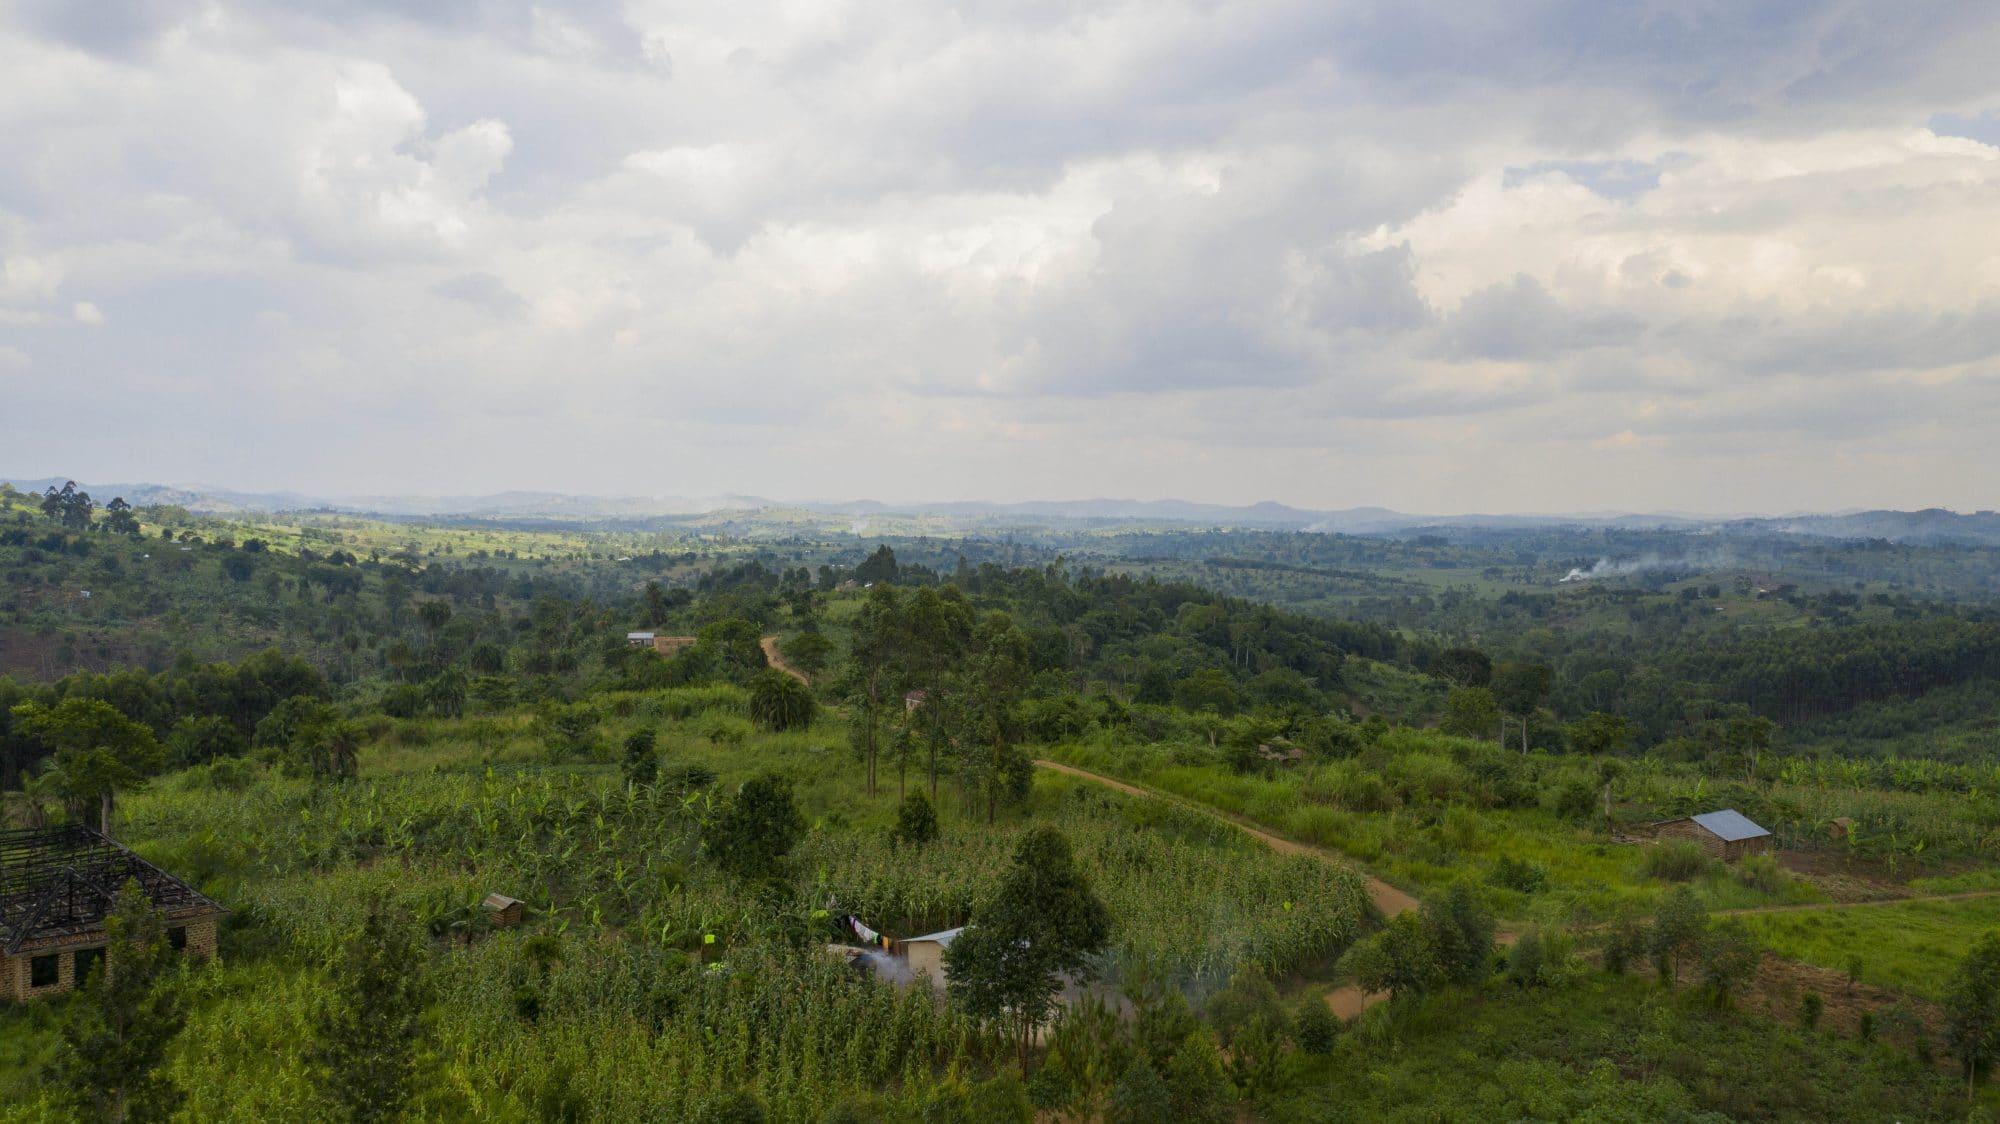 Uganda, July 2019